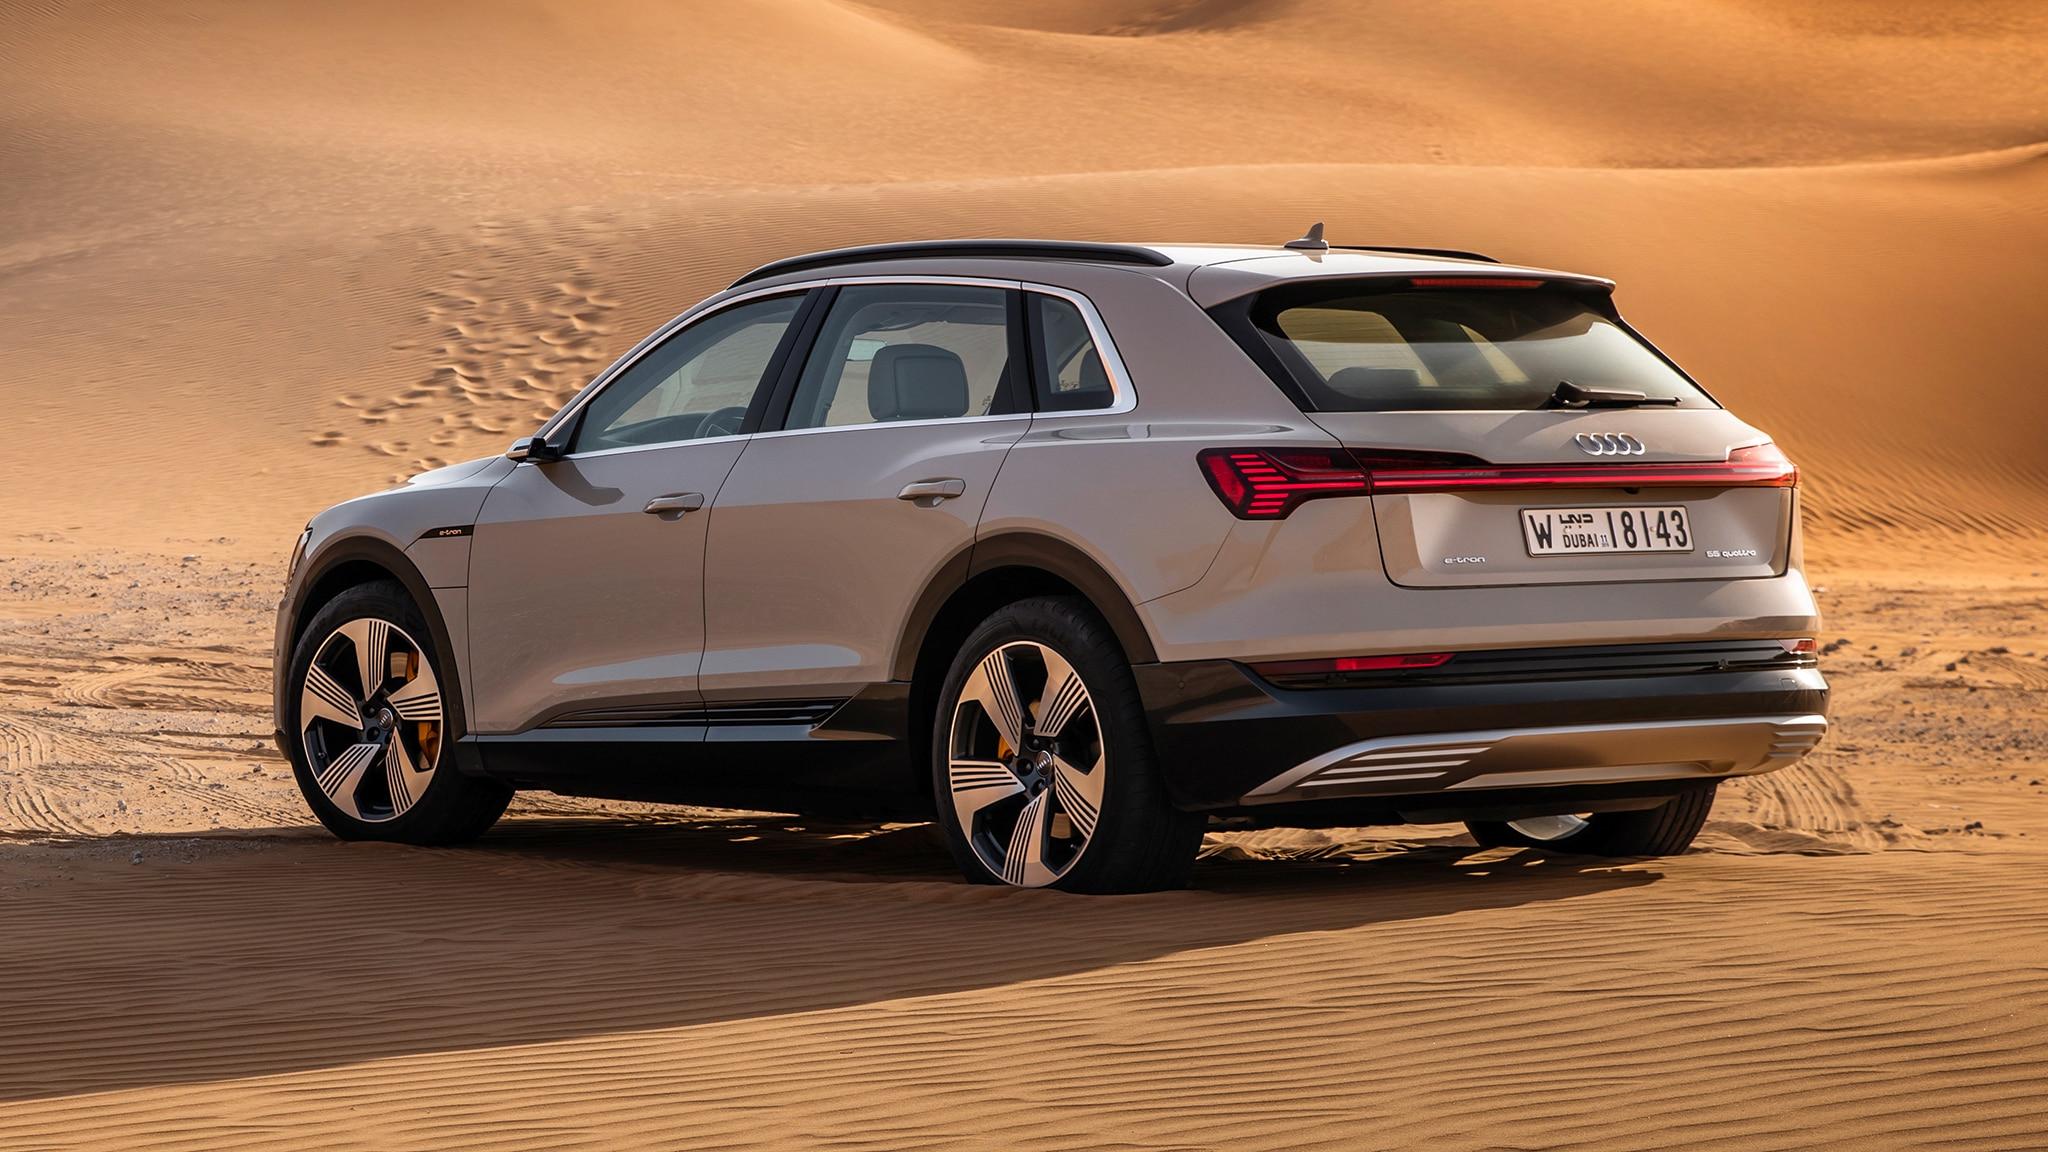 2019 Audi E-Tron Provides 204 Miles of Range | Automobile ...